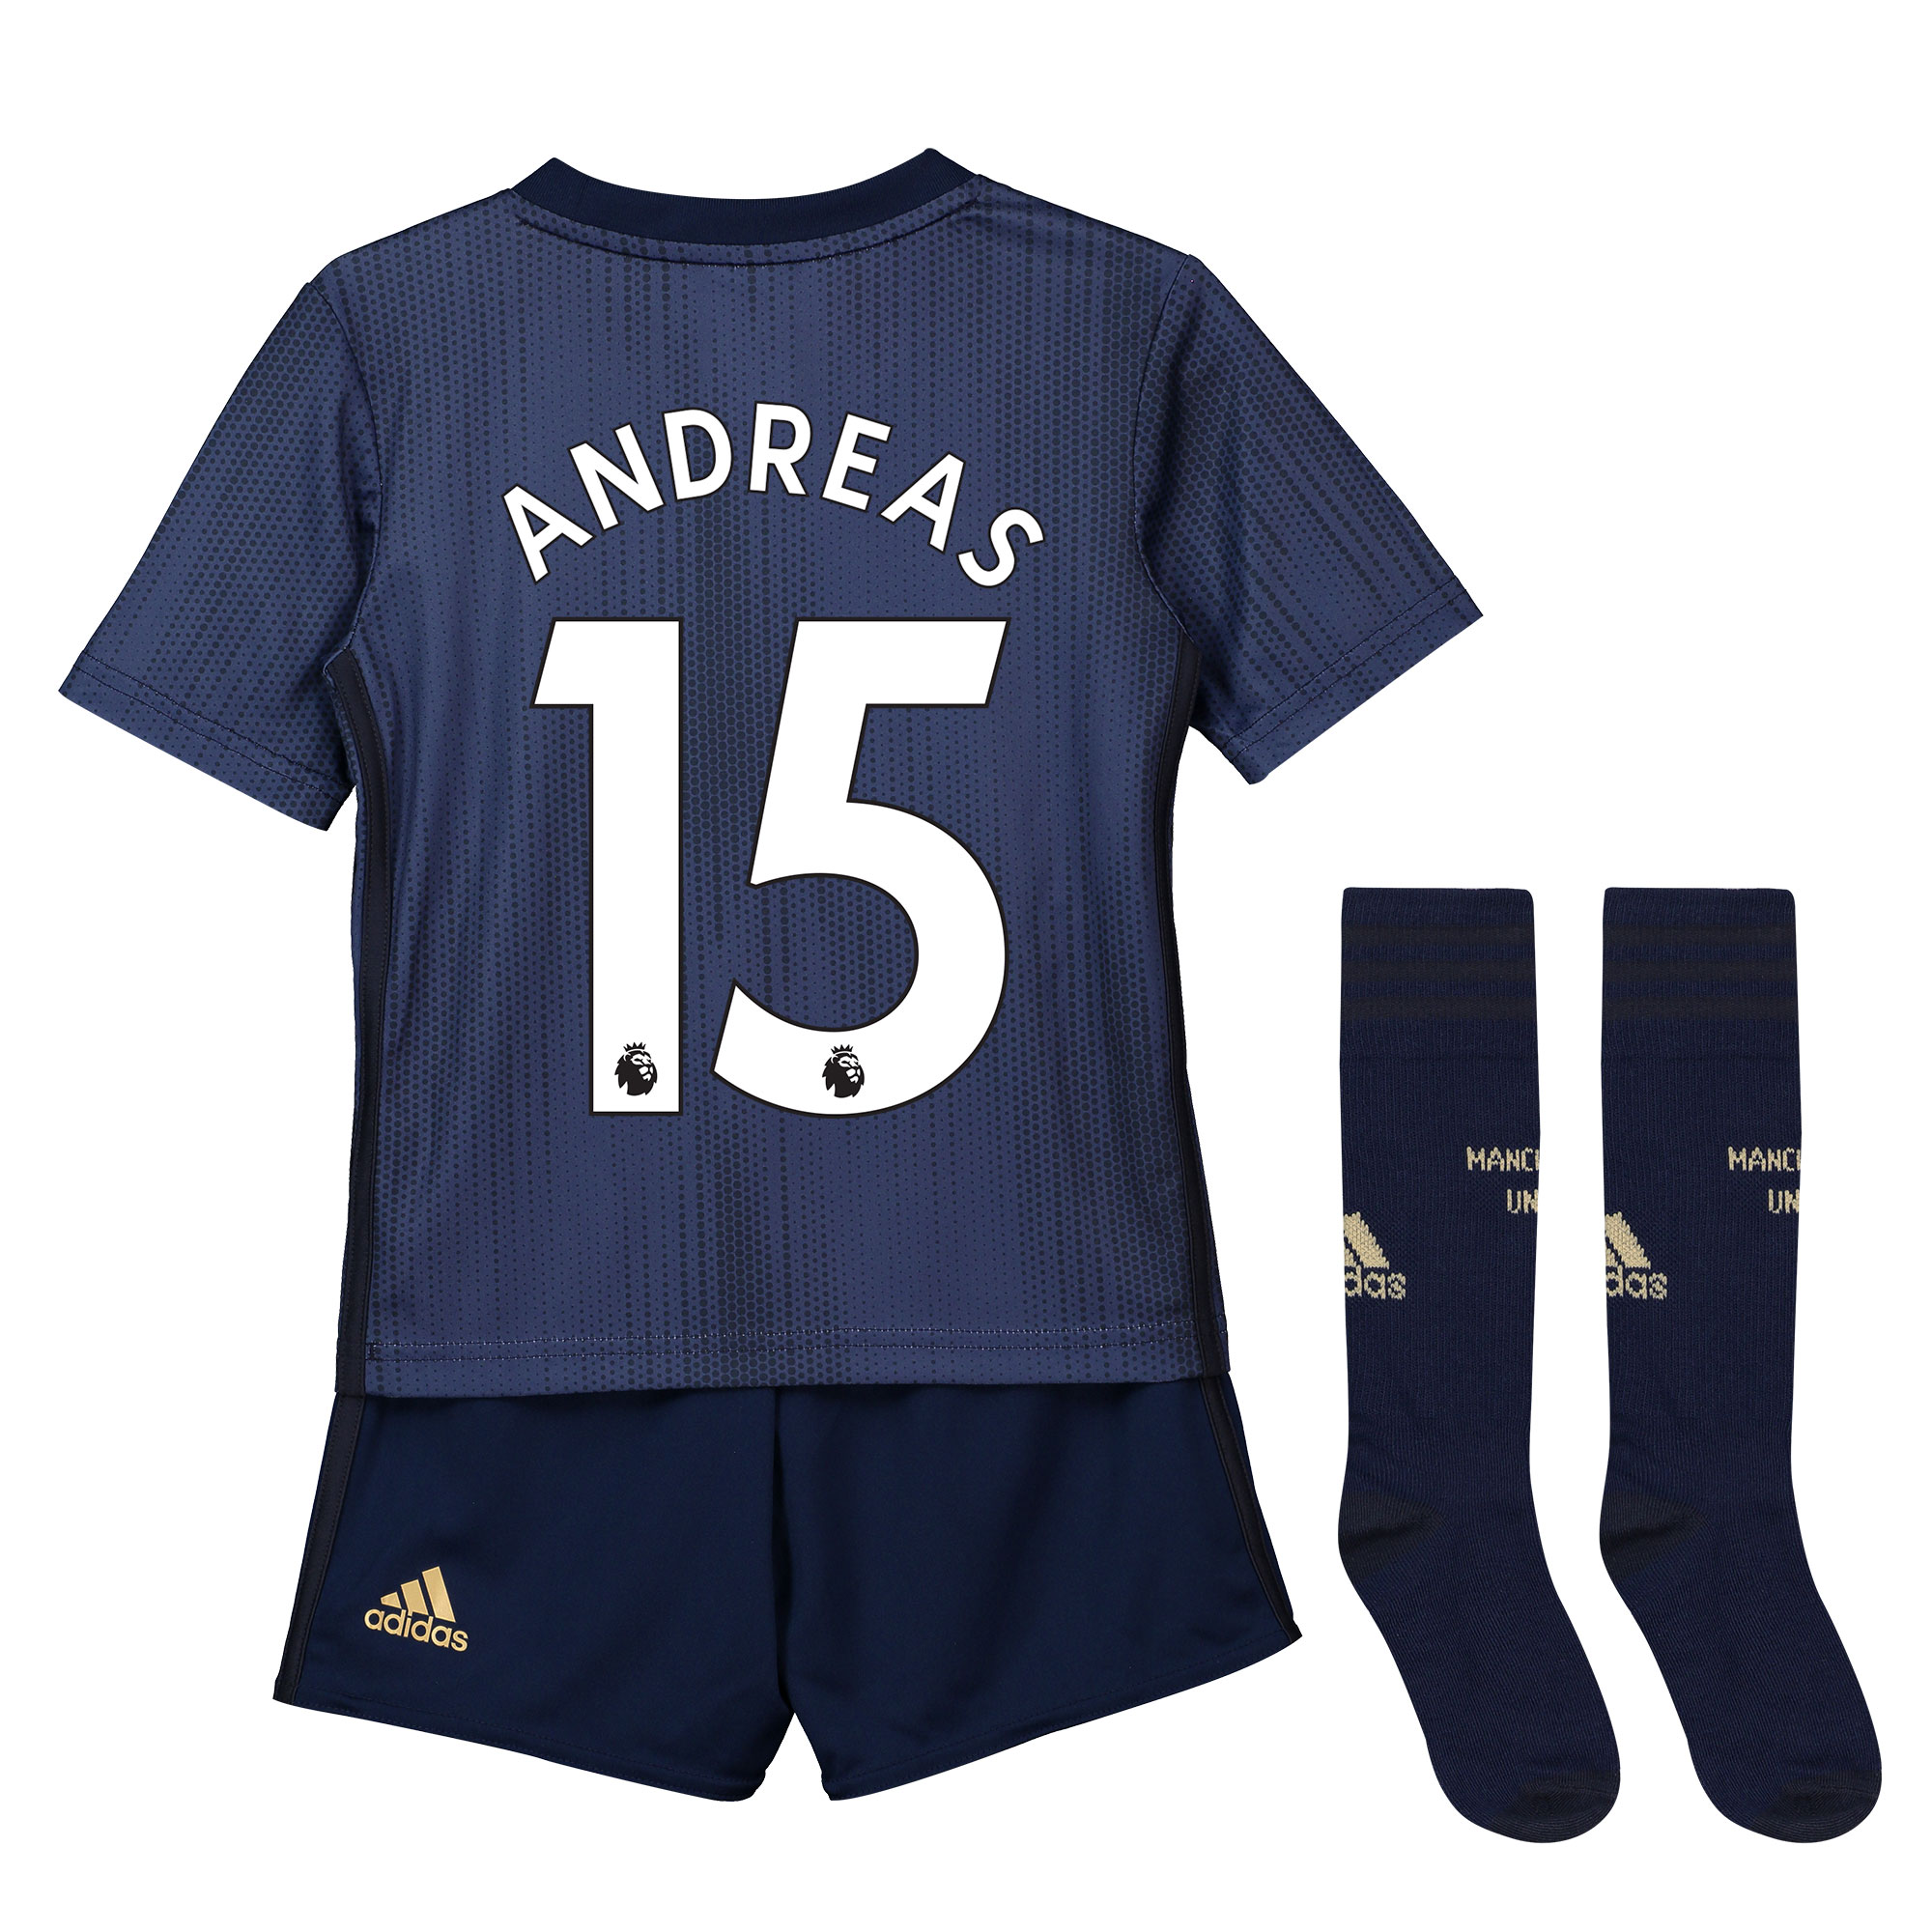 Adidas Tercera equipación en tamaño mini del Manchester United 2018-19 dorsal Andreas 15